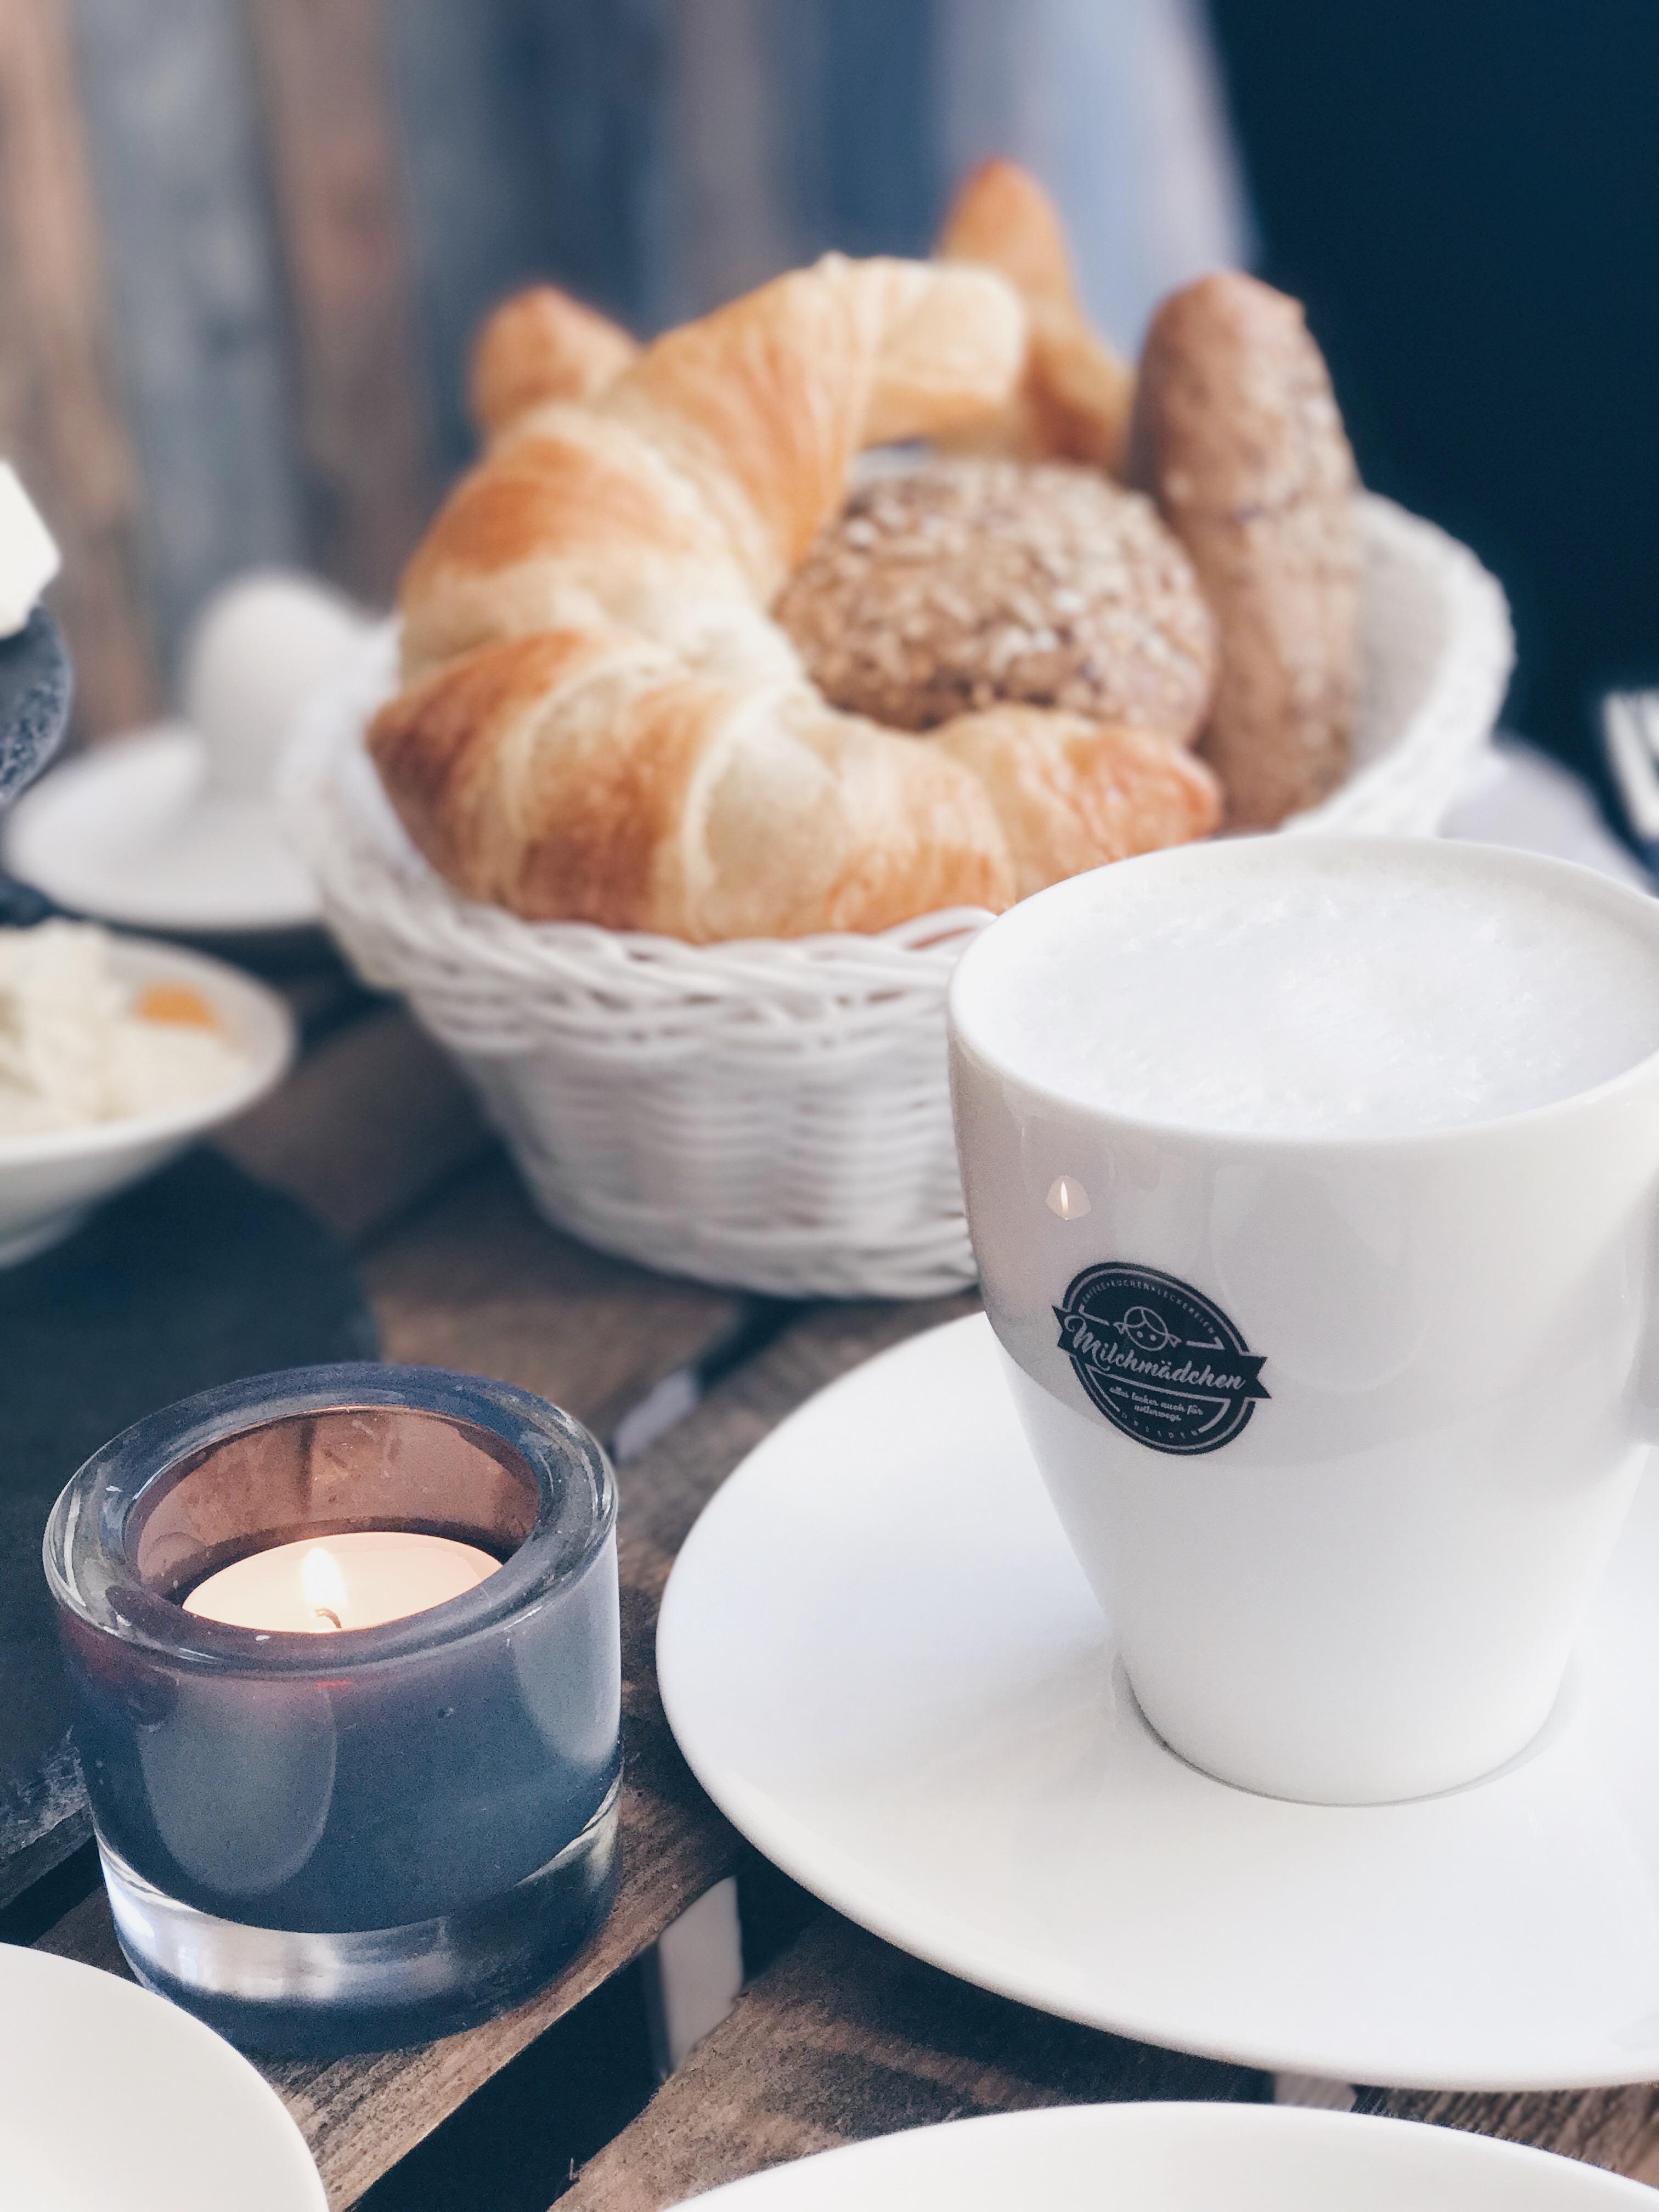 Milchmaedchen Cafe De